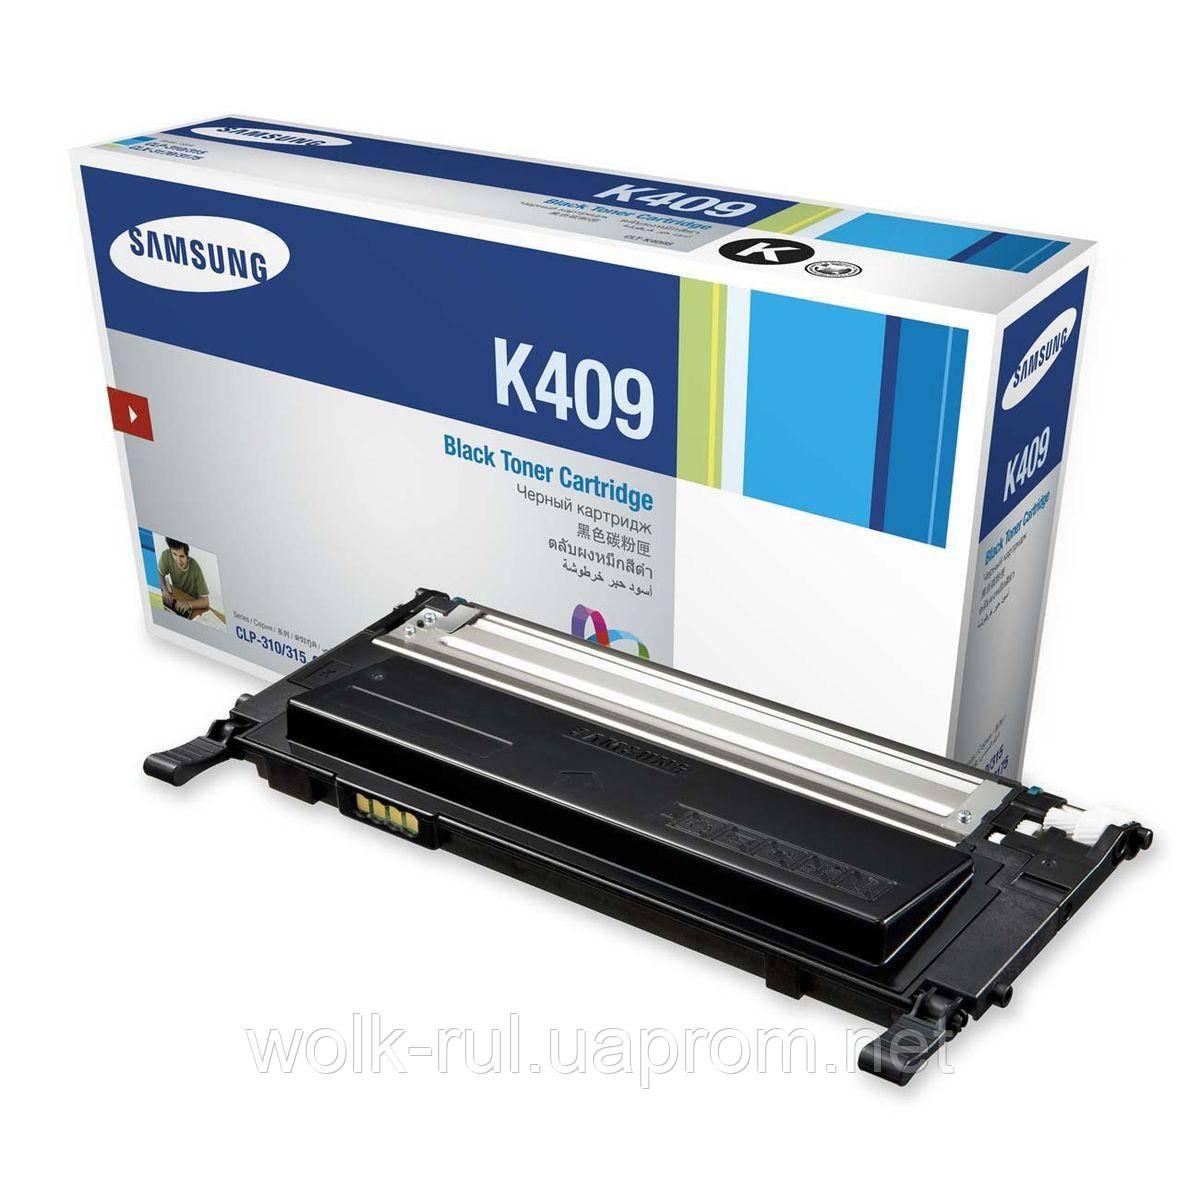 Картридж Samsung CLT-K409S, Black, CLP-310/315, CLX-3170/3175, 1.5k, OEM - Интернет-магазин  T-Shop.com.ua в Запорожье